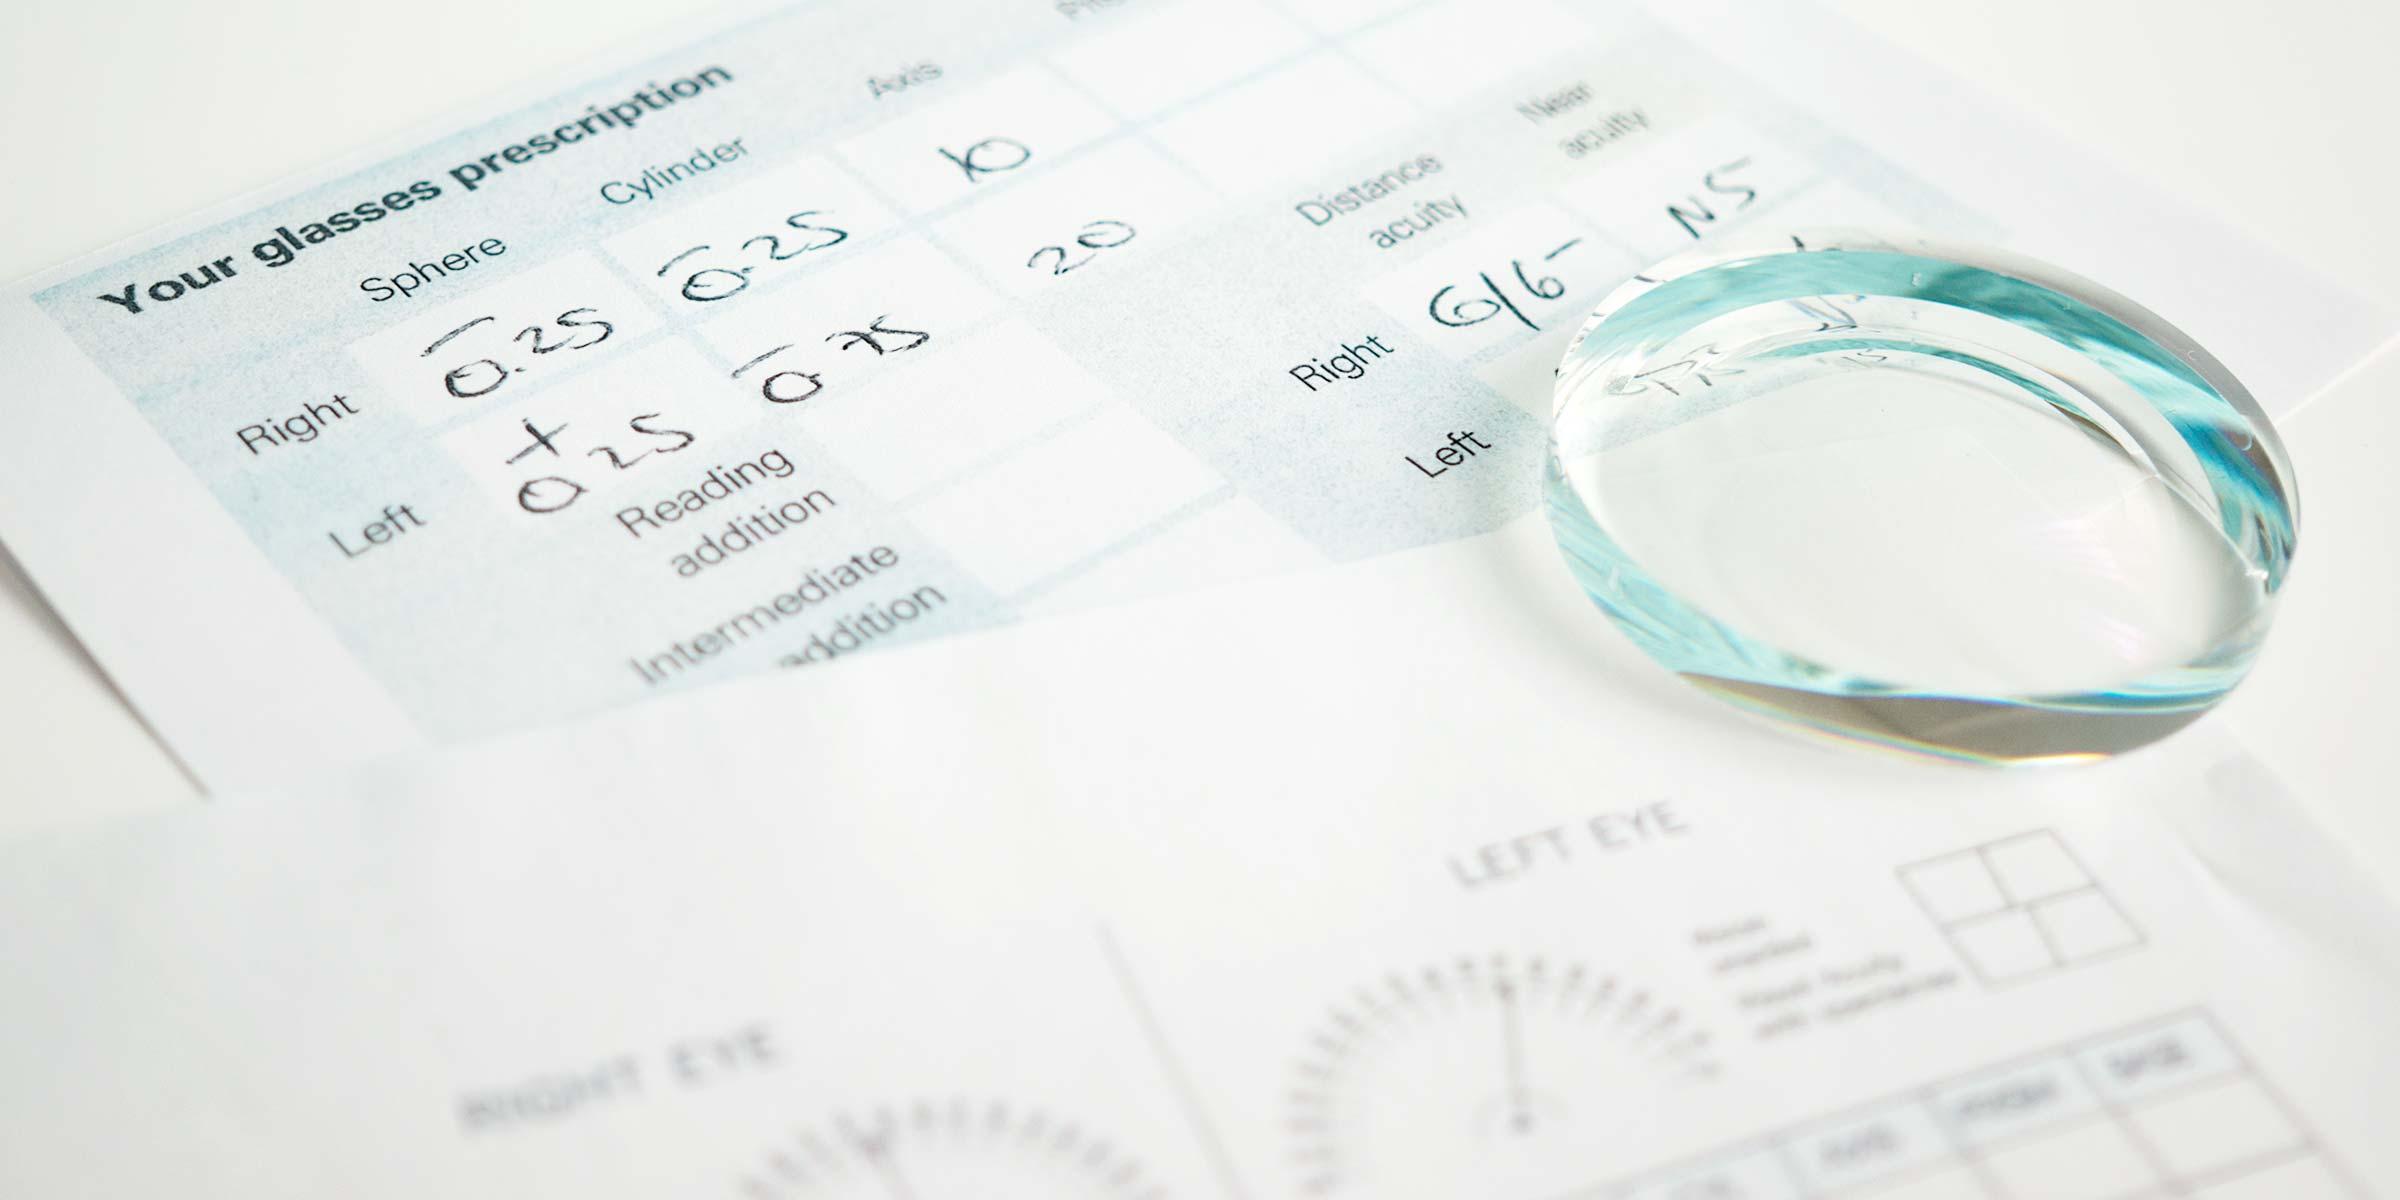 A lens lying on a prescription form